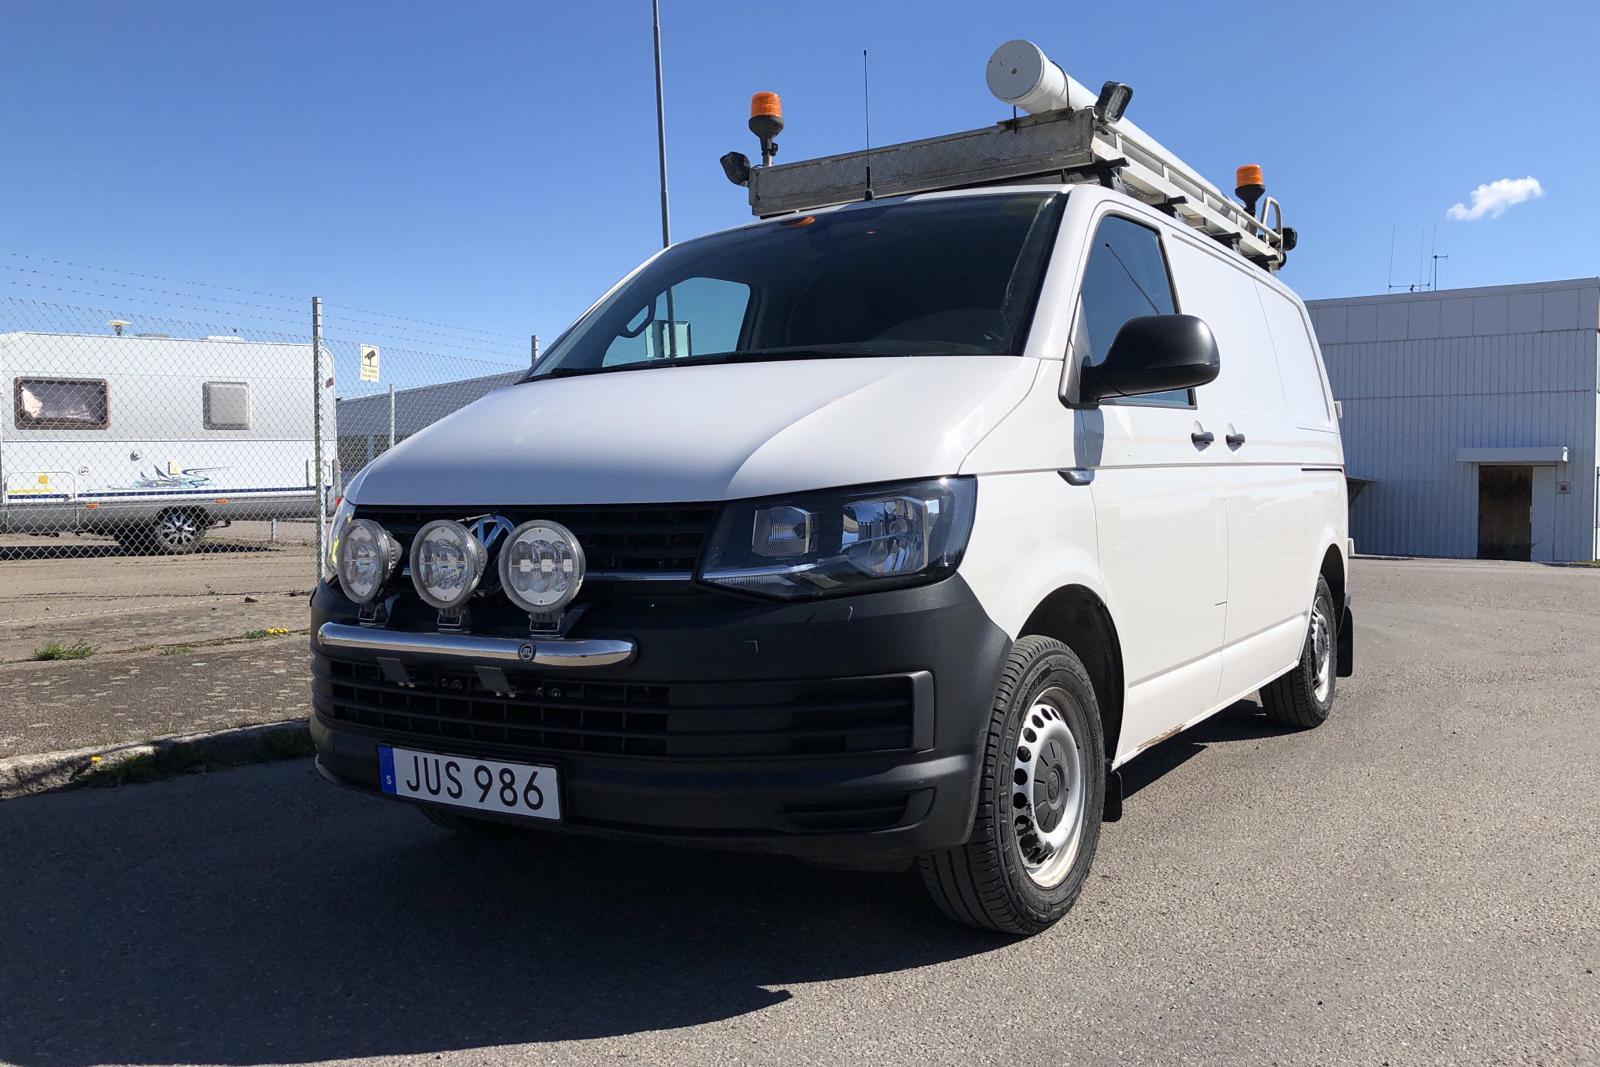 VW Transporter T6 2.0 TDI BMT Skåp 4MOTION (150hk) - 74 220 km - Automatic - white - 2016